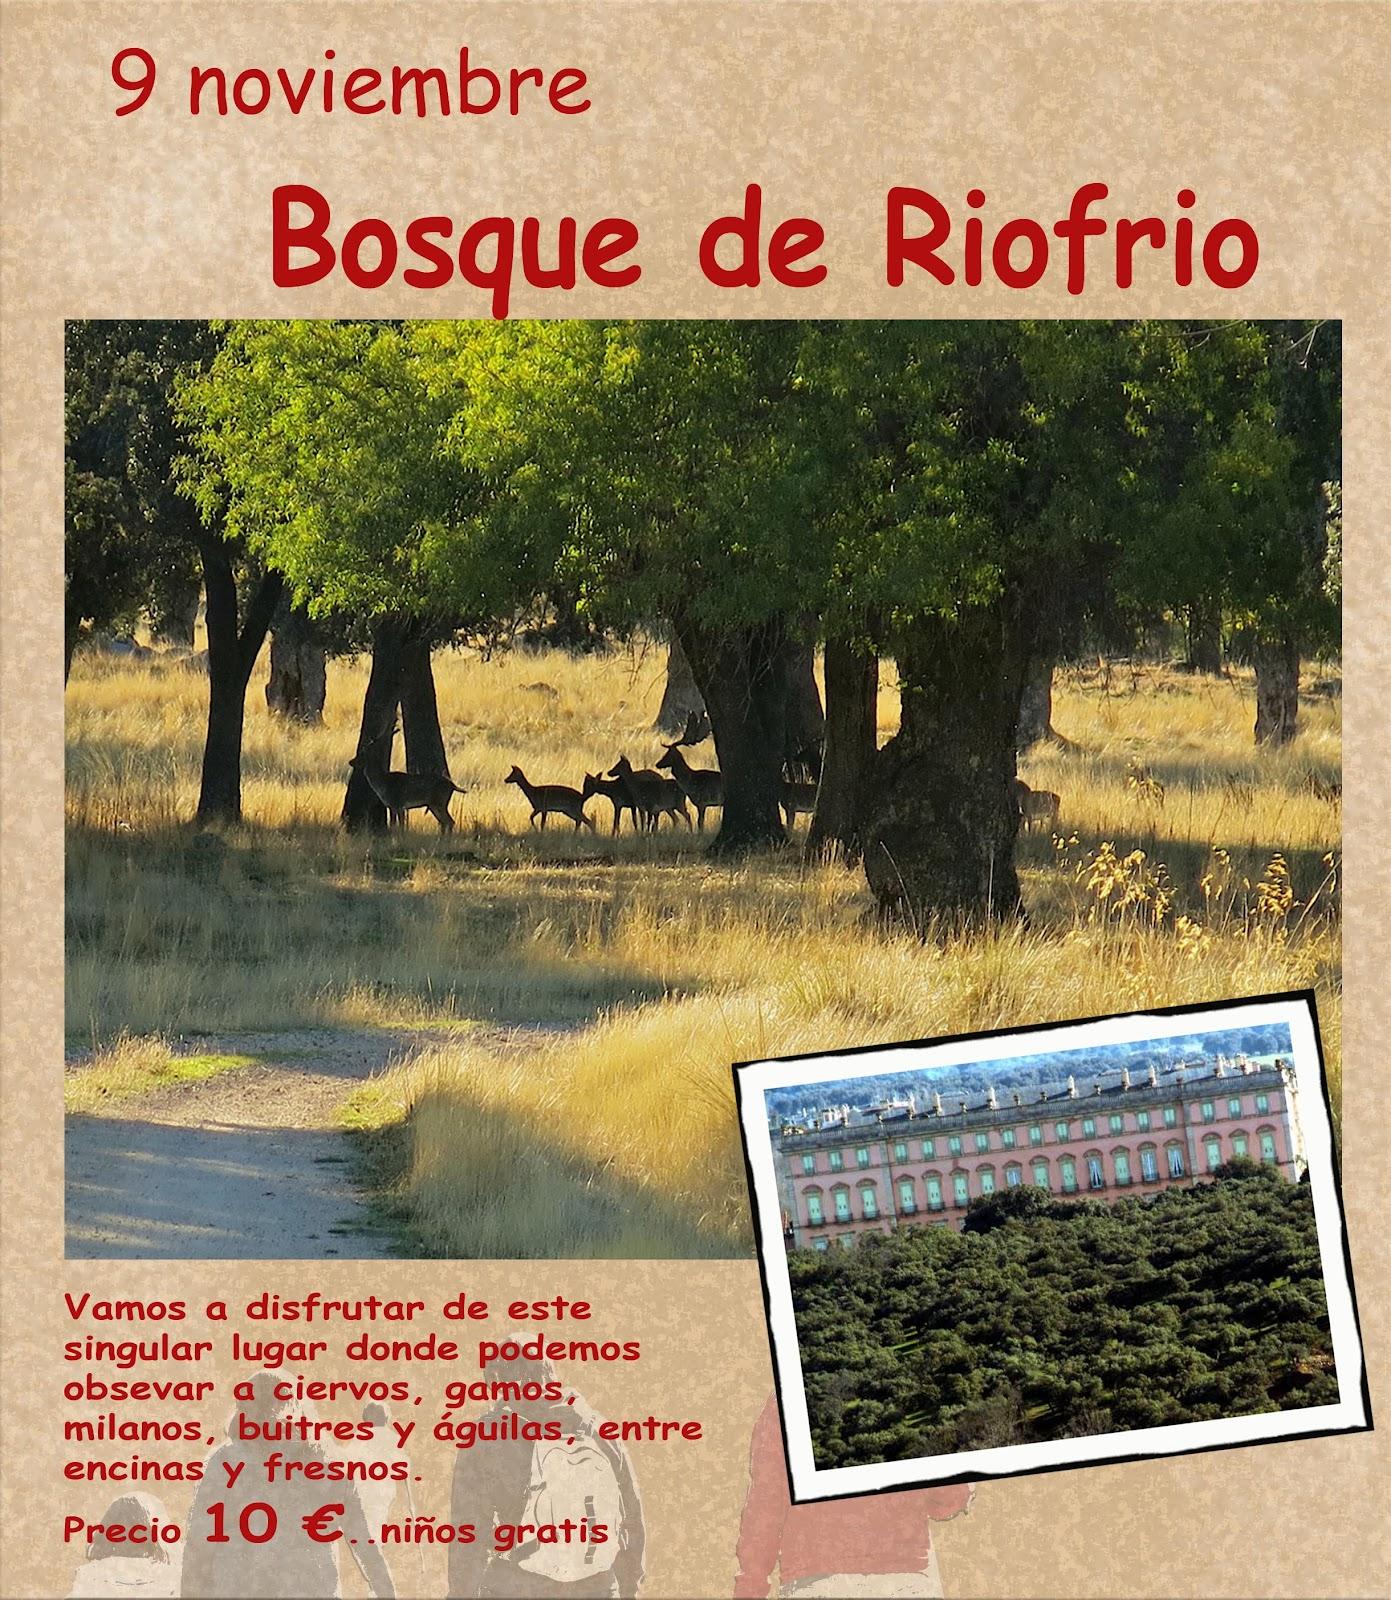 02Cartel-Riofrio.jpg